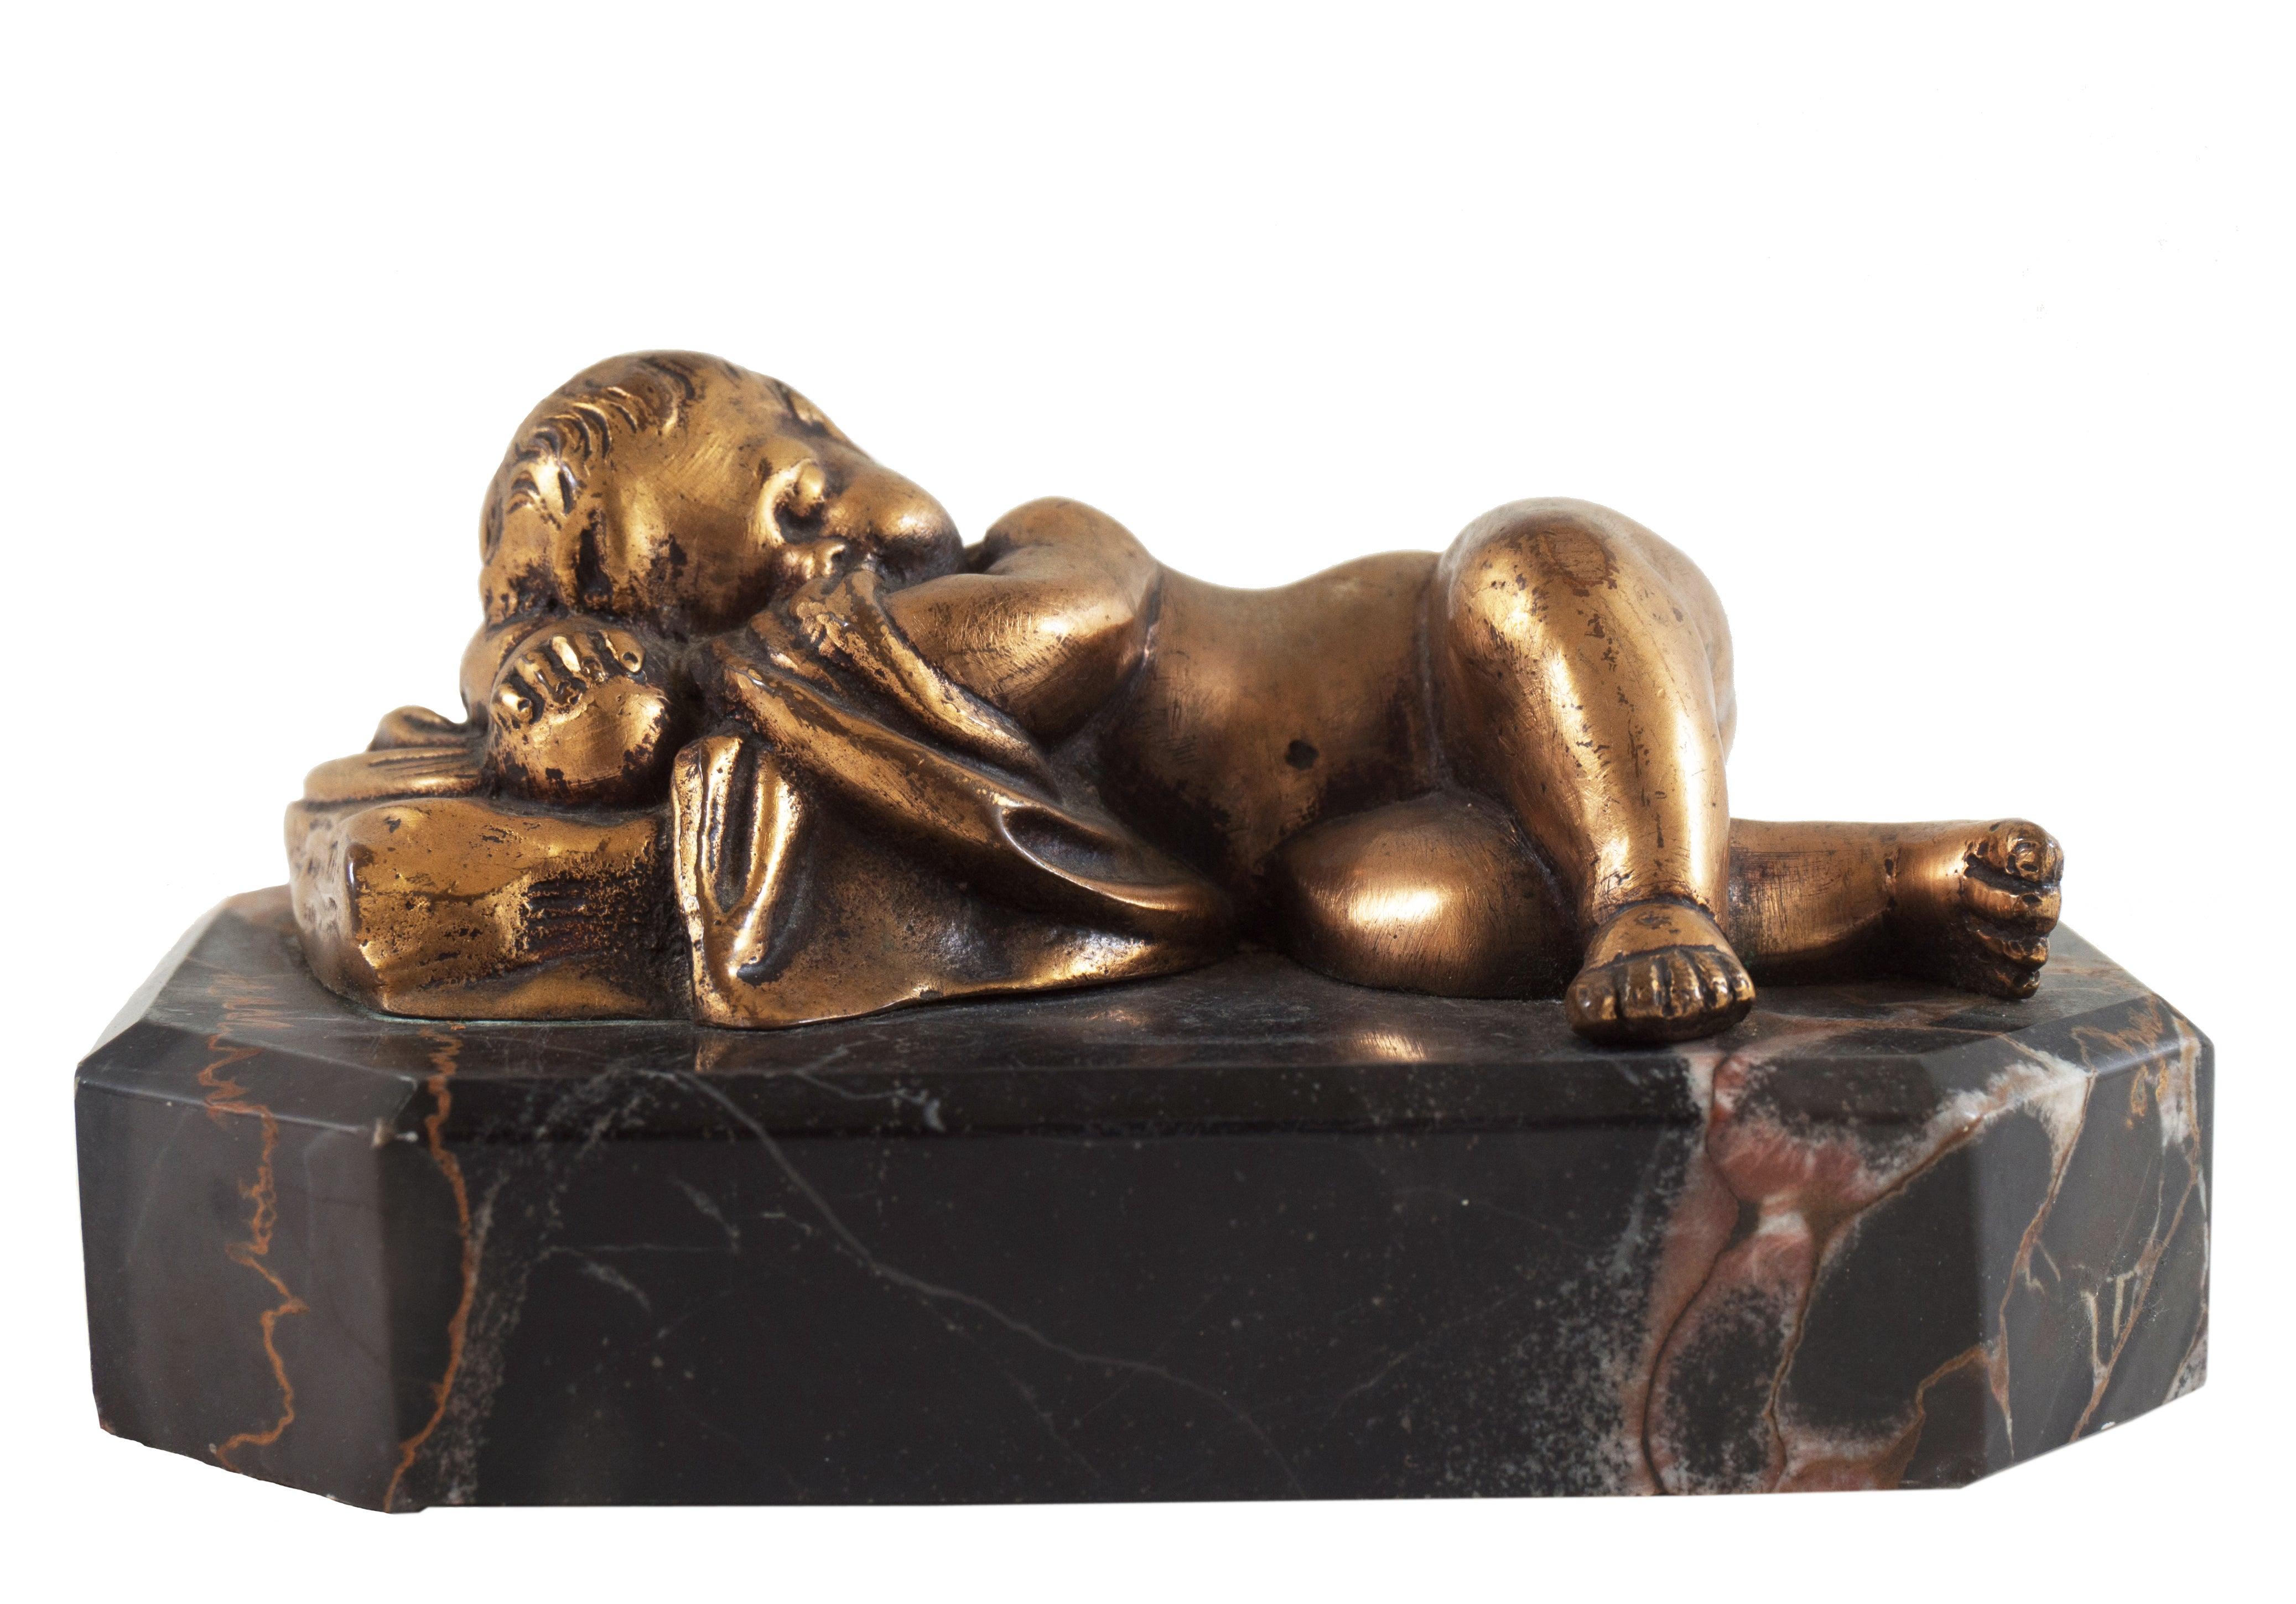 'Sleeping Cherub' Small Beaux Arts gilt-bronze sculpture on Portoro Marble Base